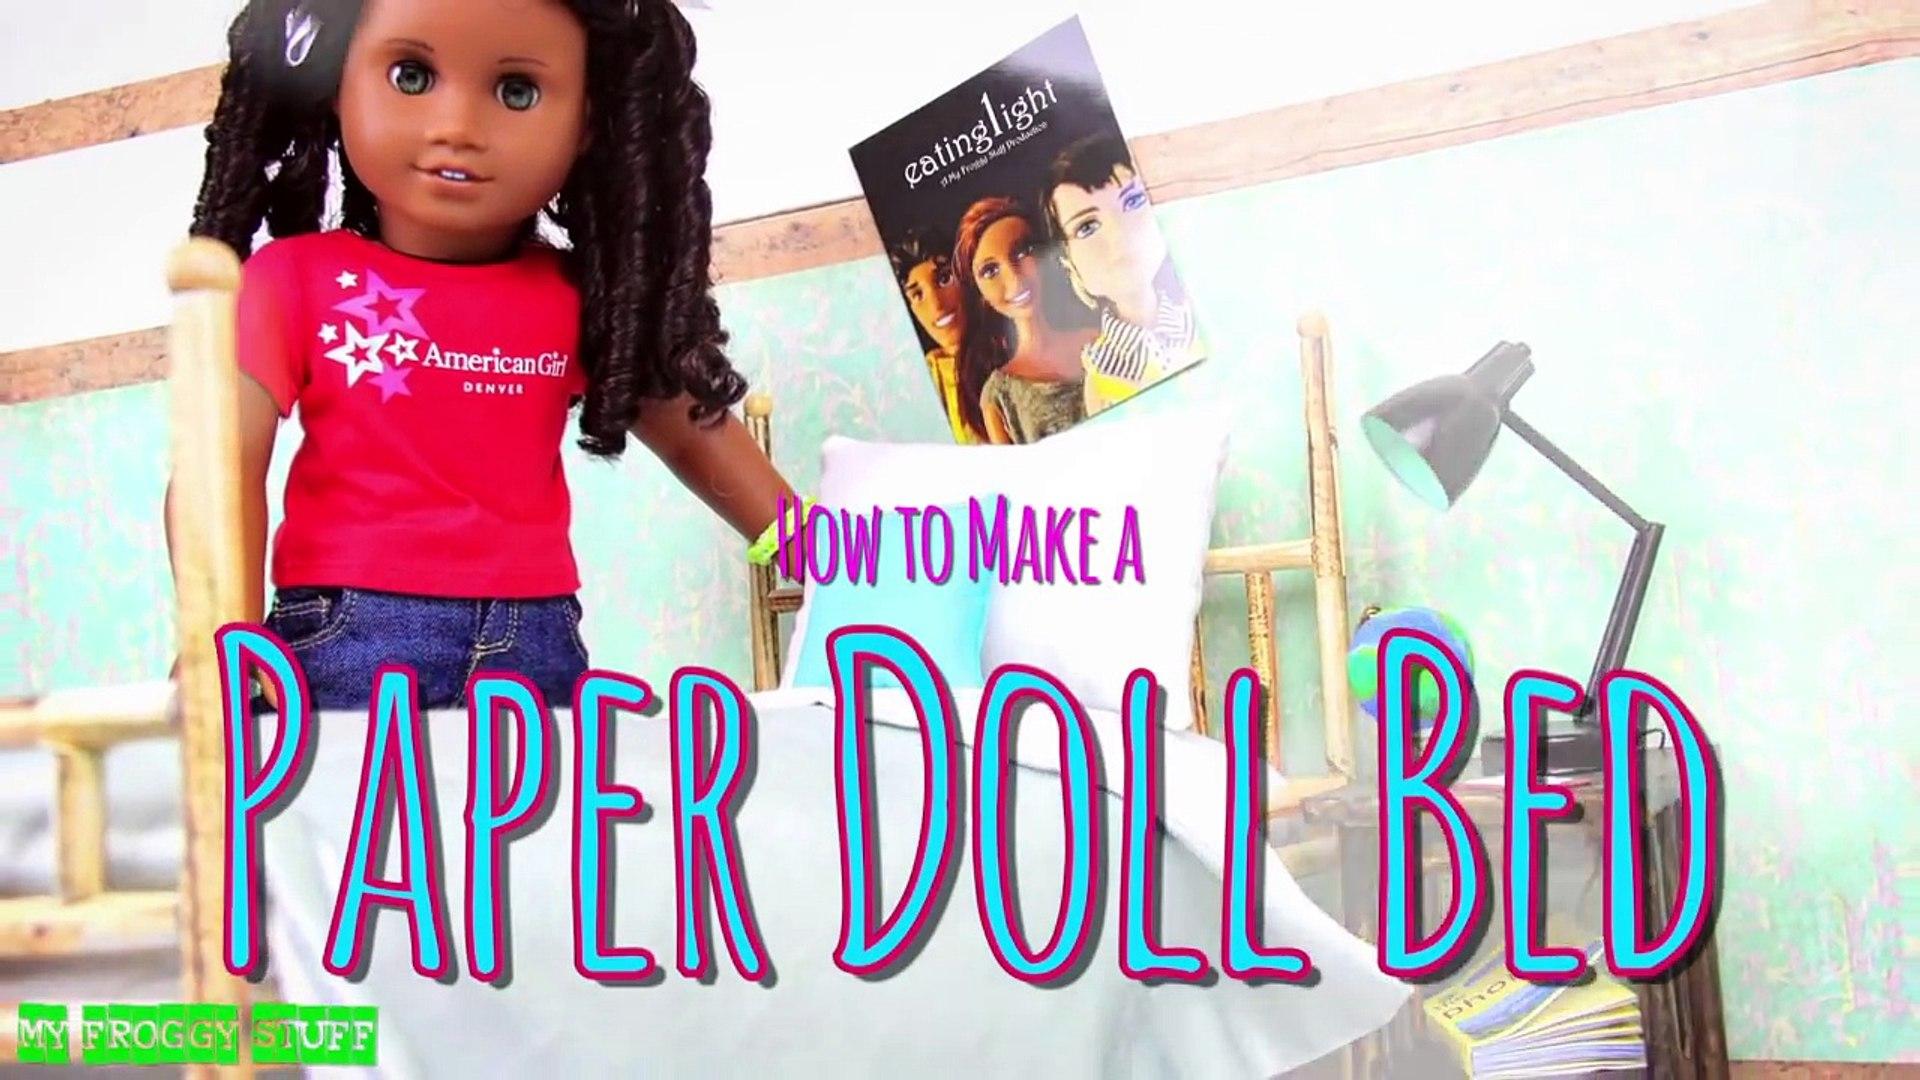 Make A DOLL BED | Diy barbie furniture, Doll bed diy, Diy barbie house | 1080x1920